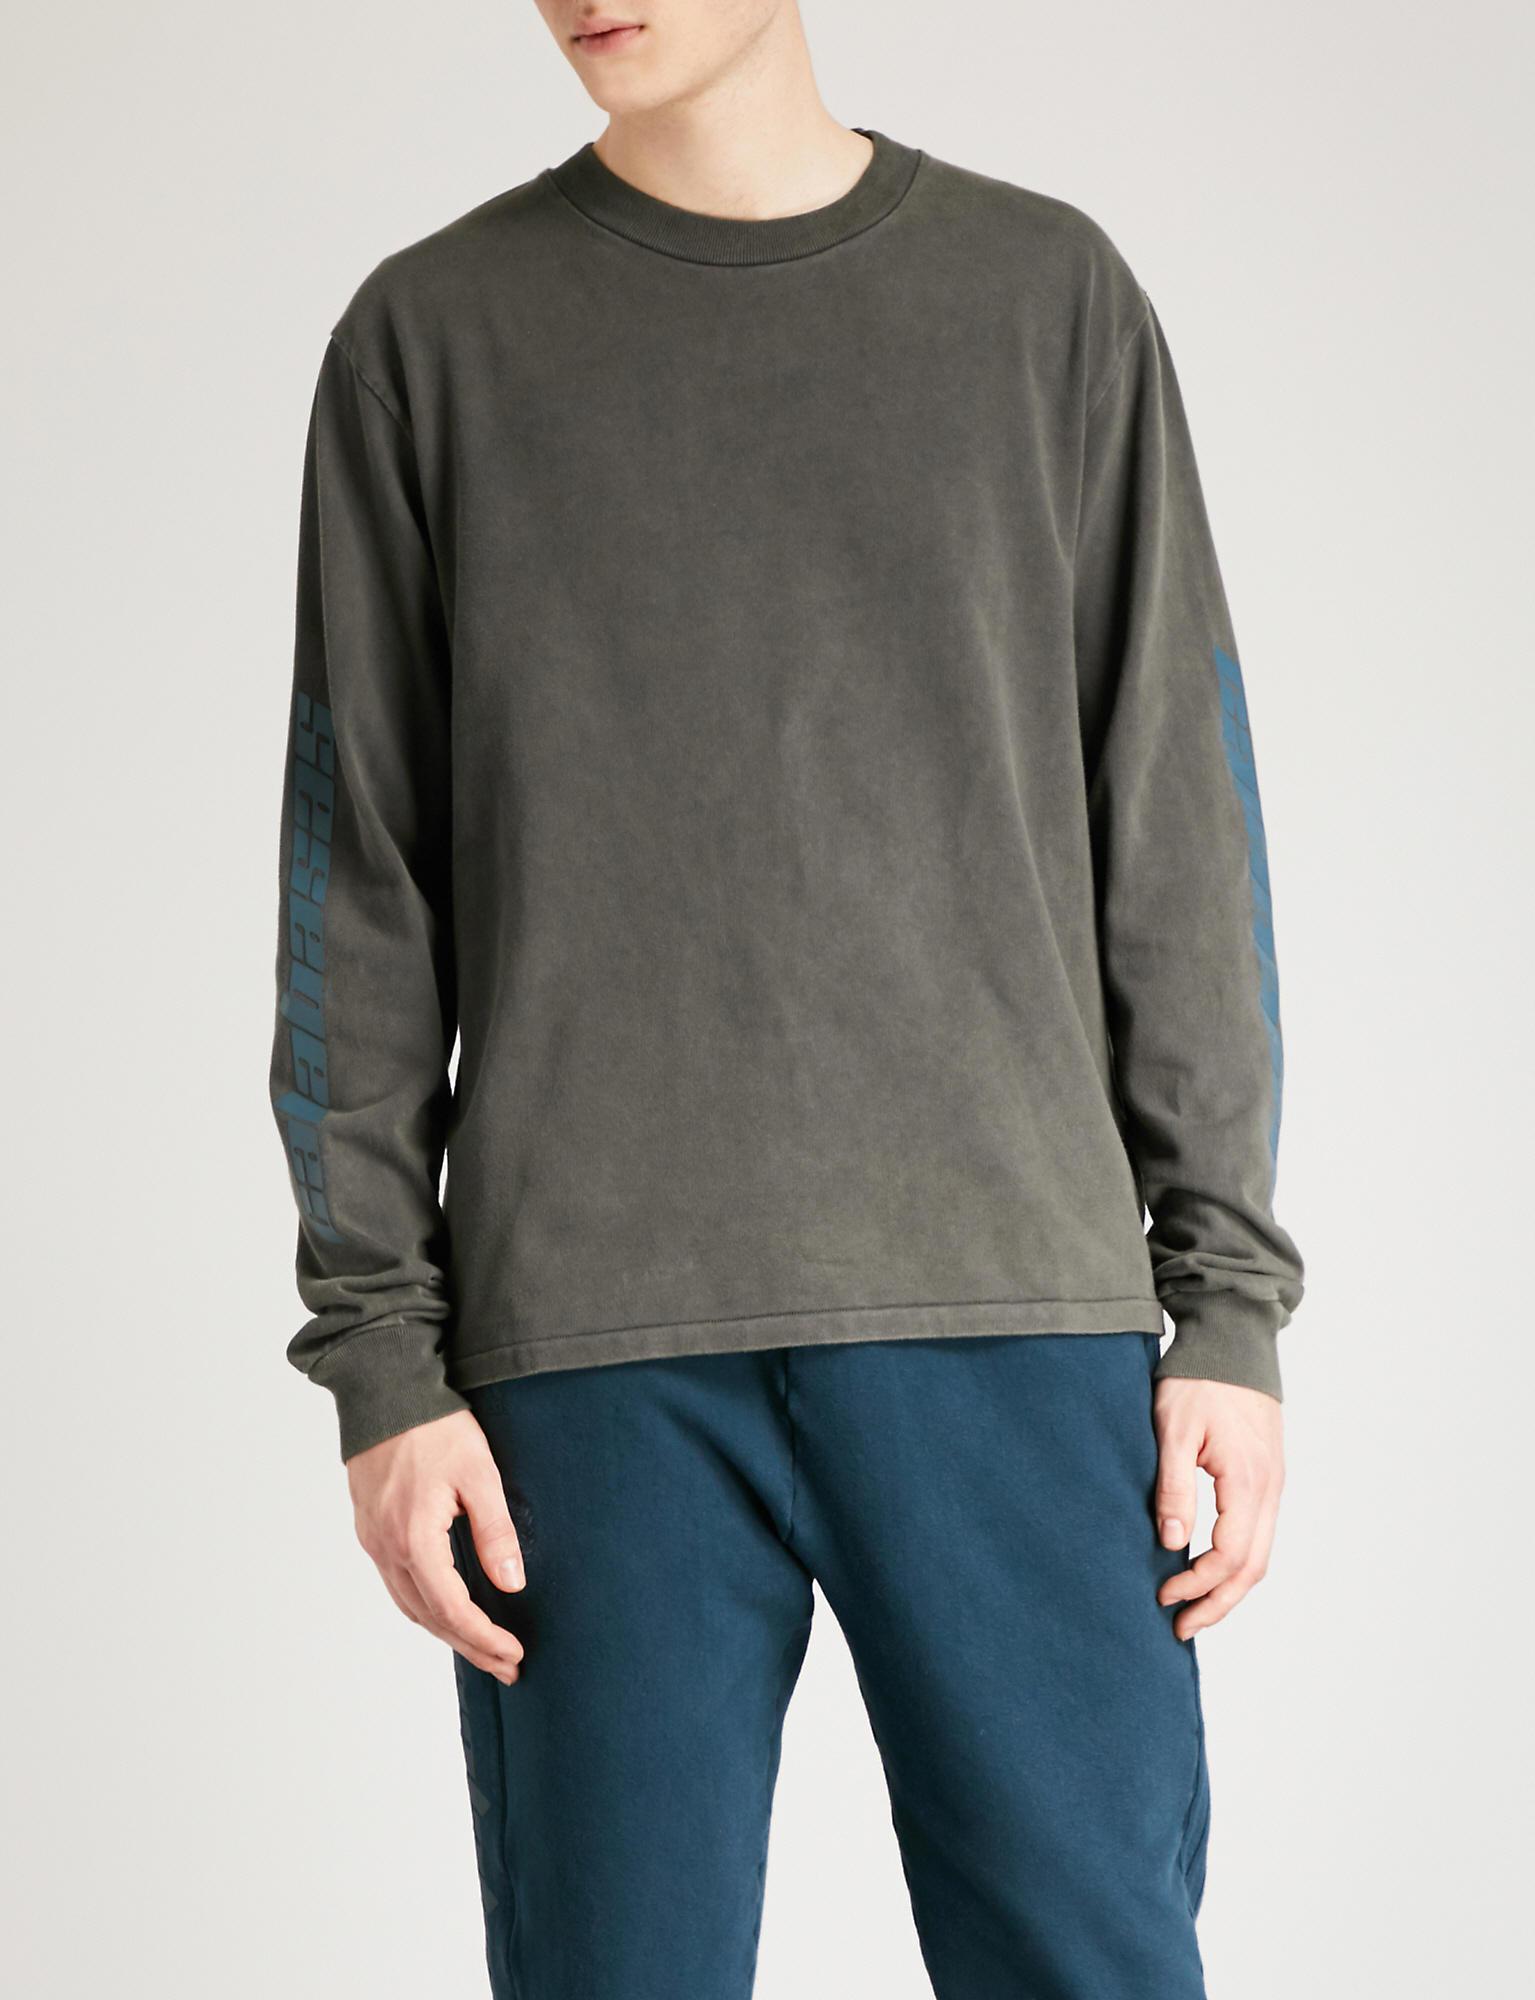 d0a035ce2 Lyst - Yeezy Season 6 Calabasas-print Cotton-jersey Sweatshirt in ...